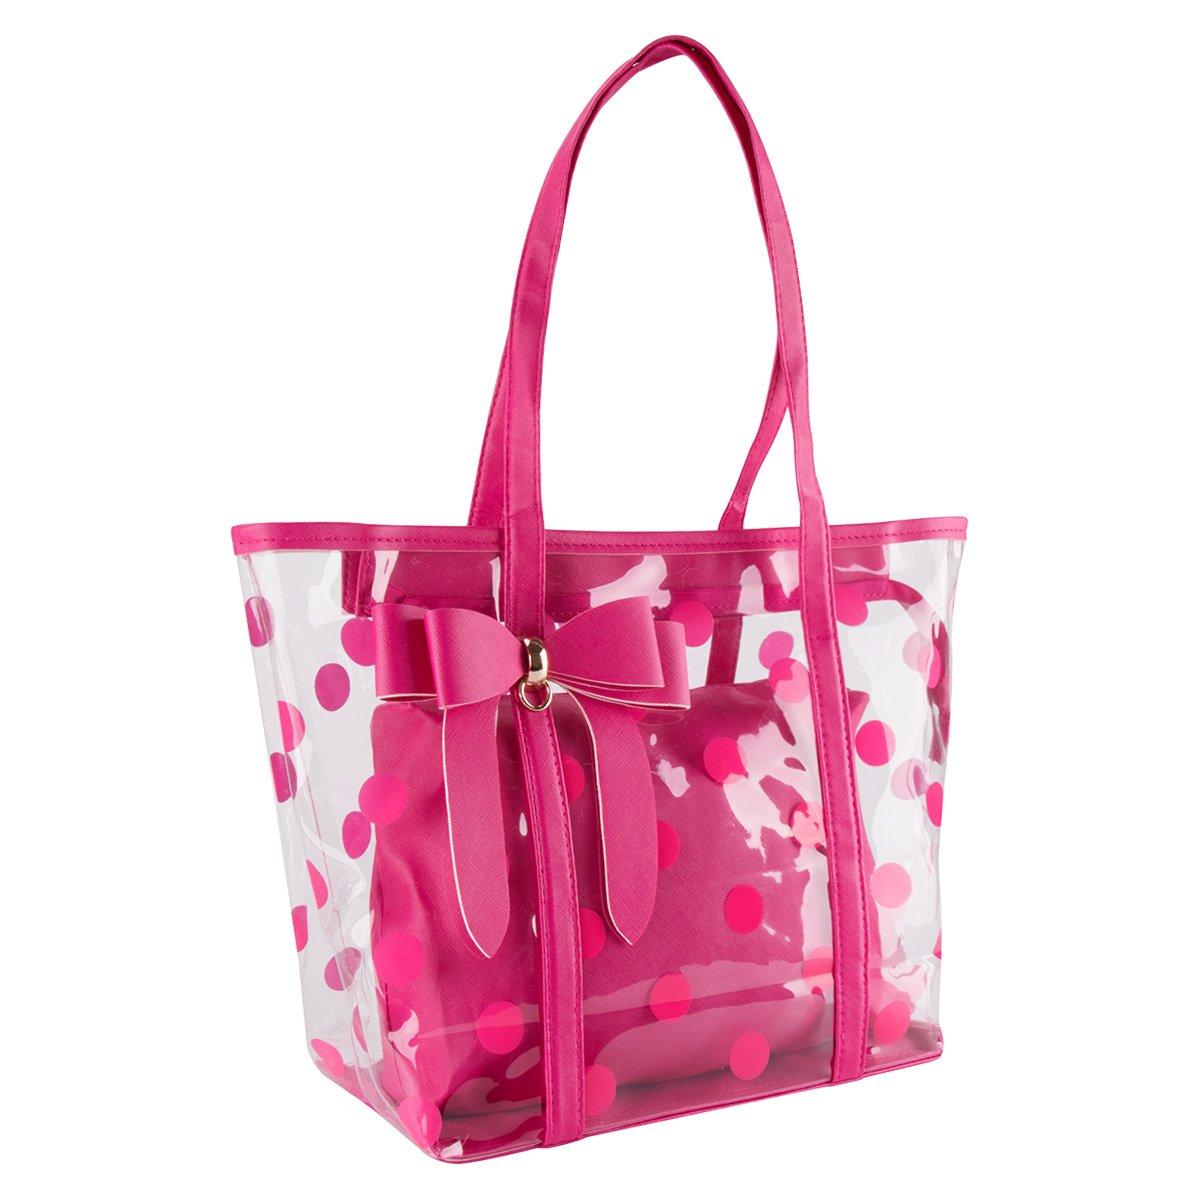 xhorizon FL1 Women Clear Tote Bag Purse Work Bag Waterproof Travel Bag Beach Handbag Gym Sports Bag